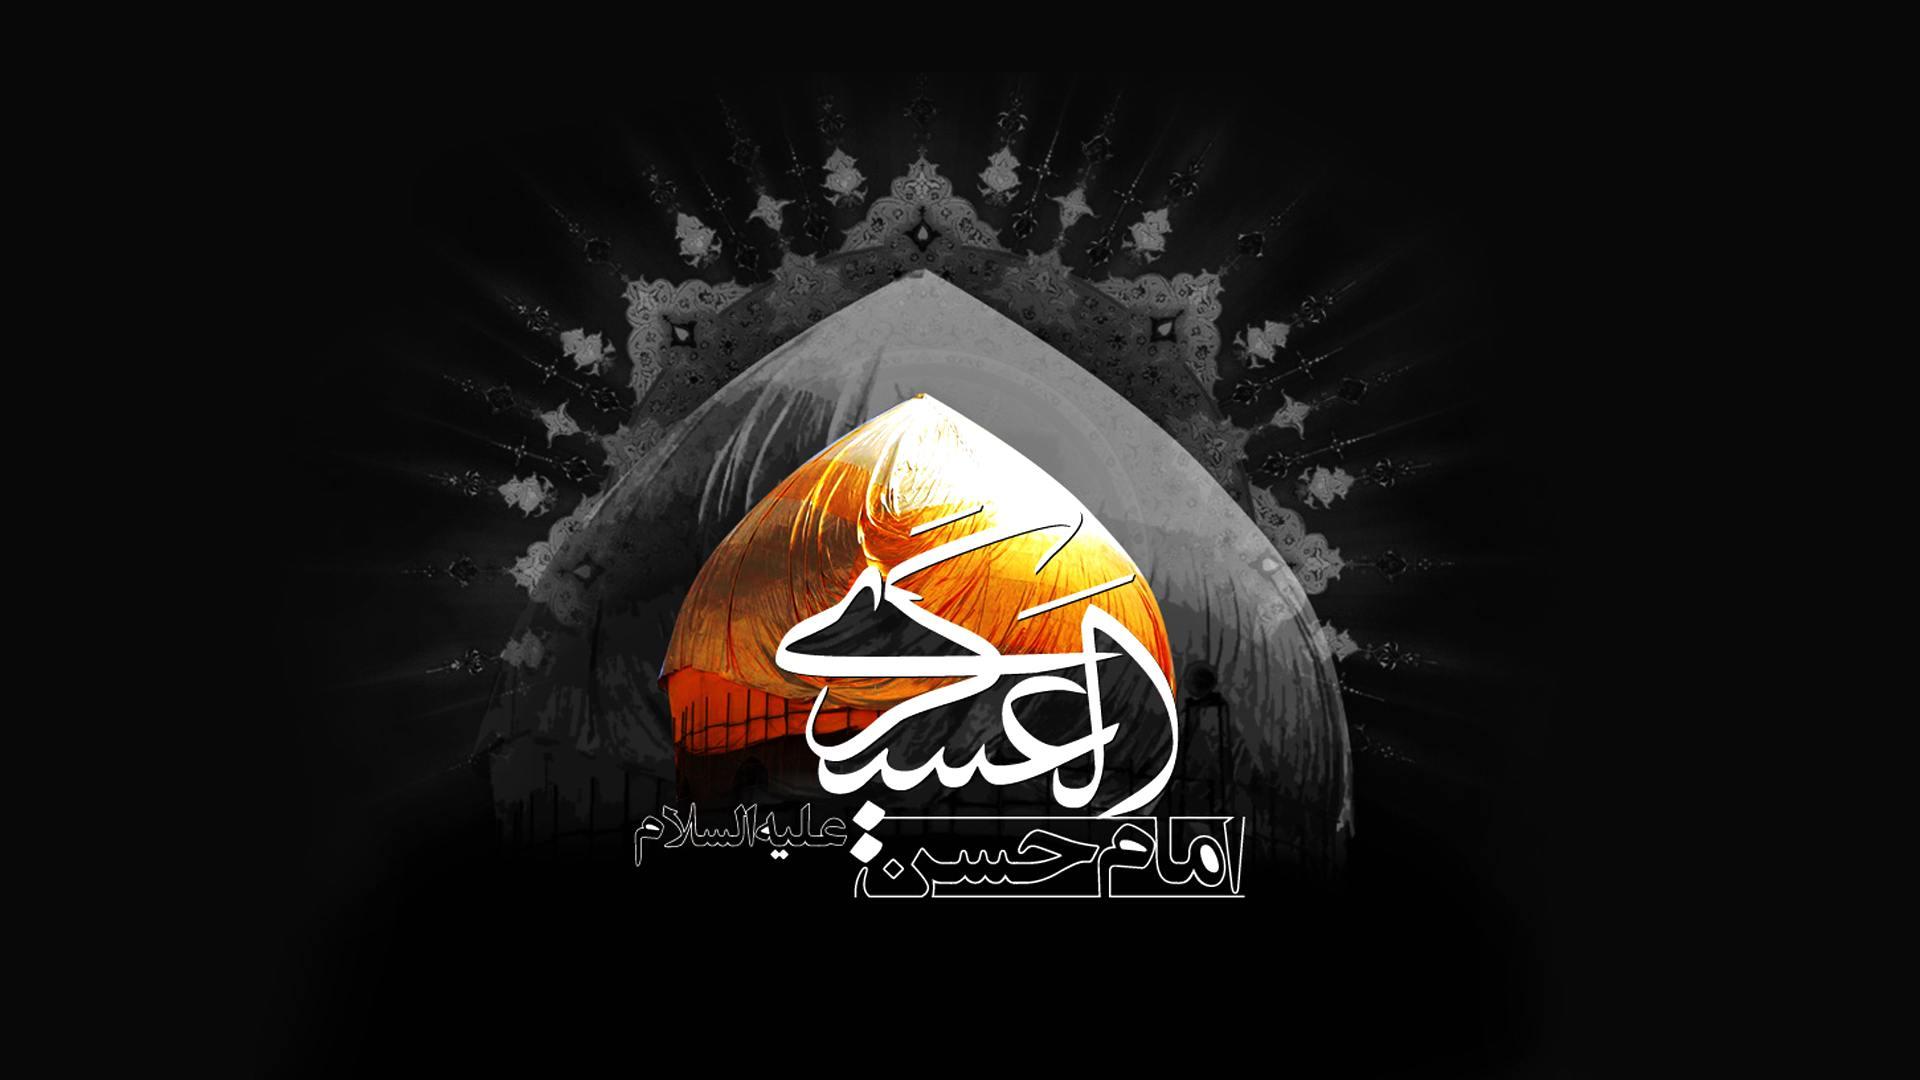 تصویر از گلچین مداحی ویژه شهادت امام حسن عسکری (علیه السلام)